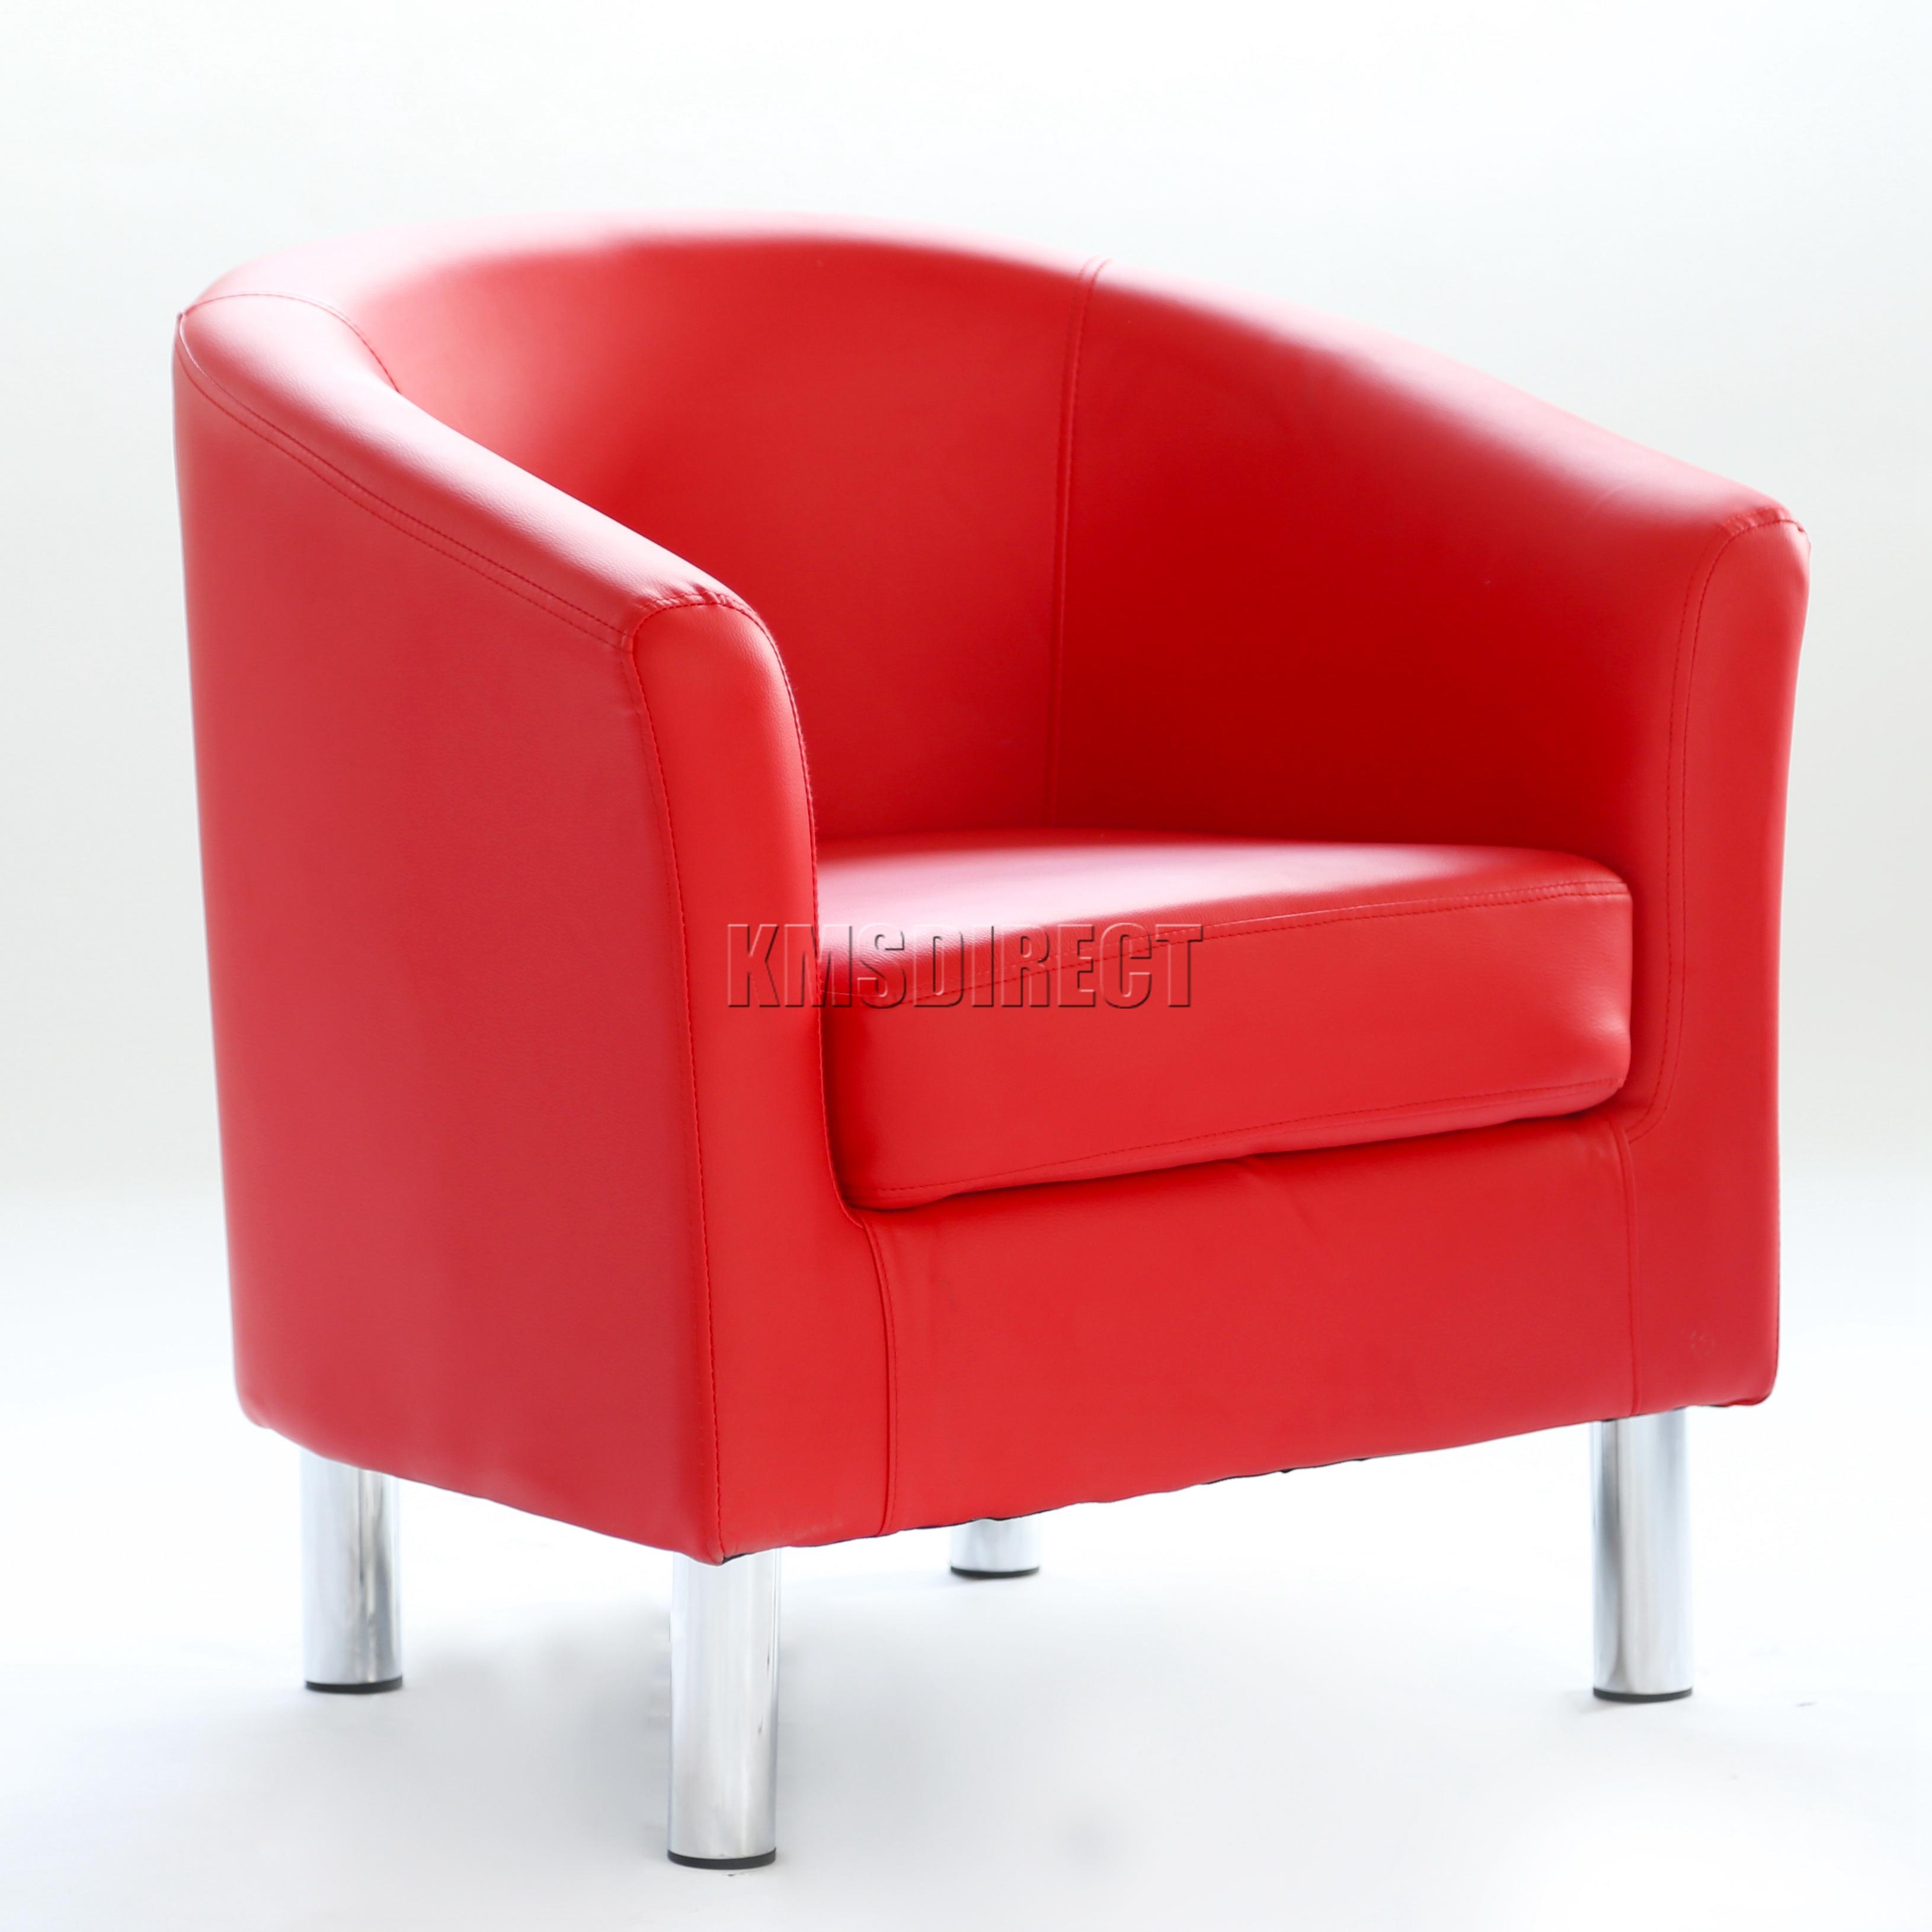 FoxHunter Modern Tub Chair Armchair PU Faux Leather With Chrome